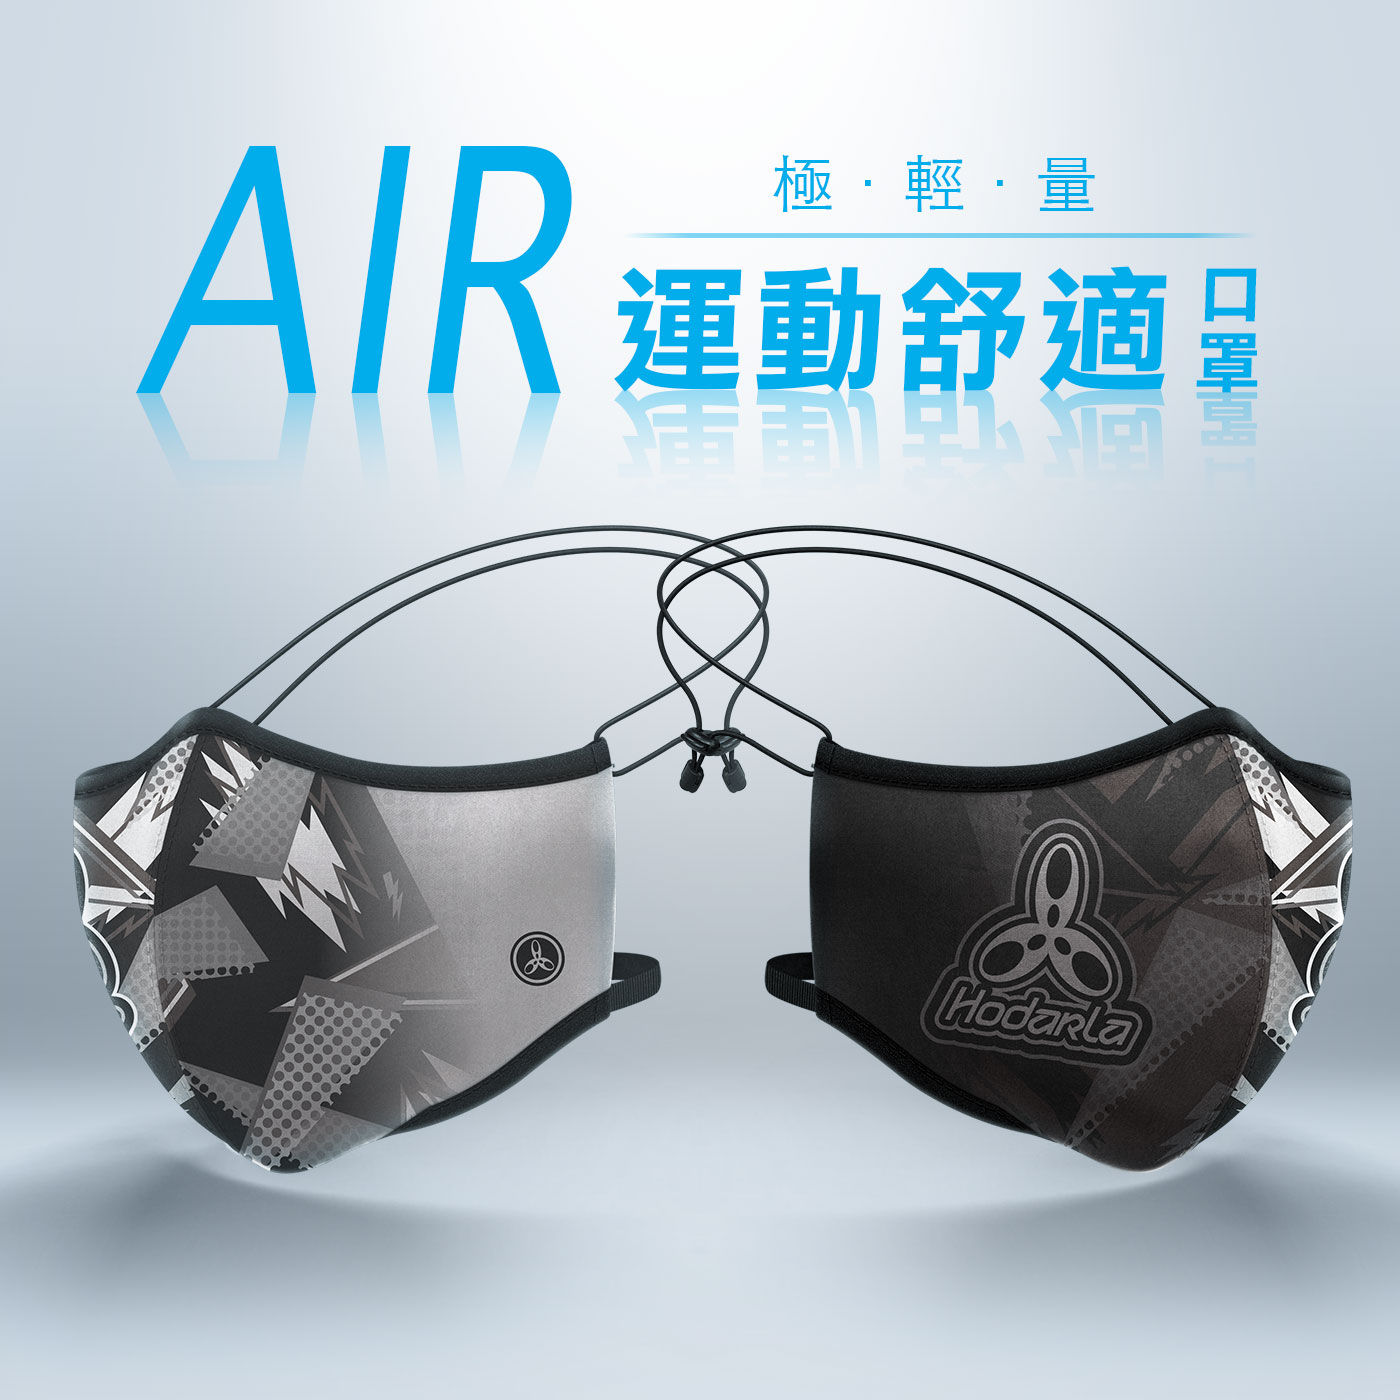 HODARLA AIR 運動舒適口罩 6032249